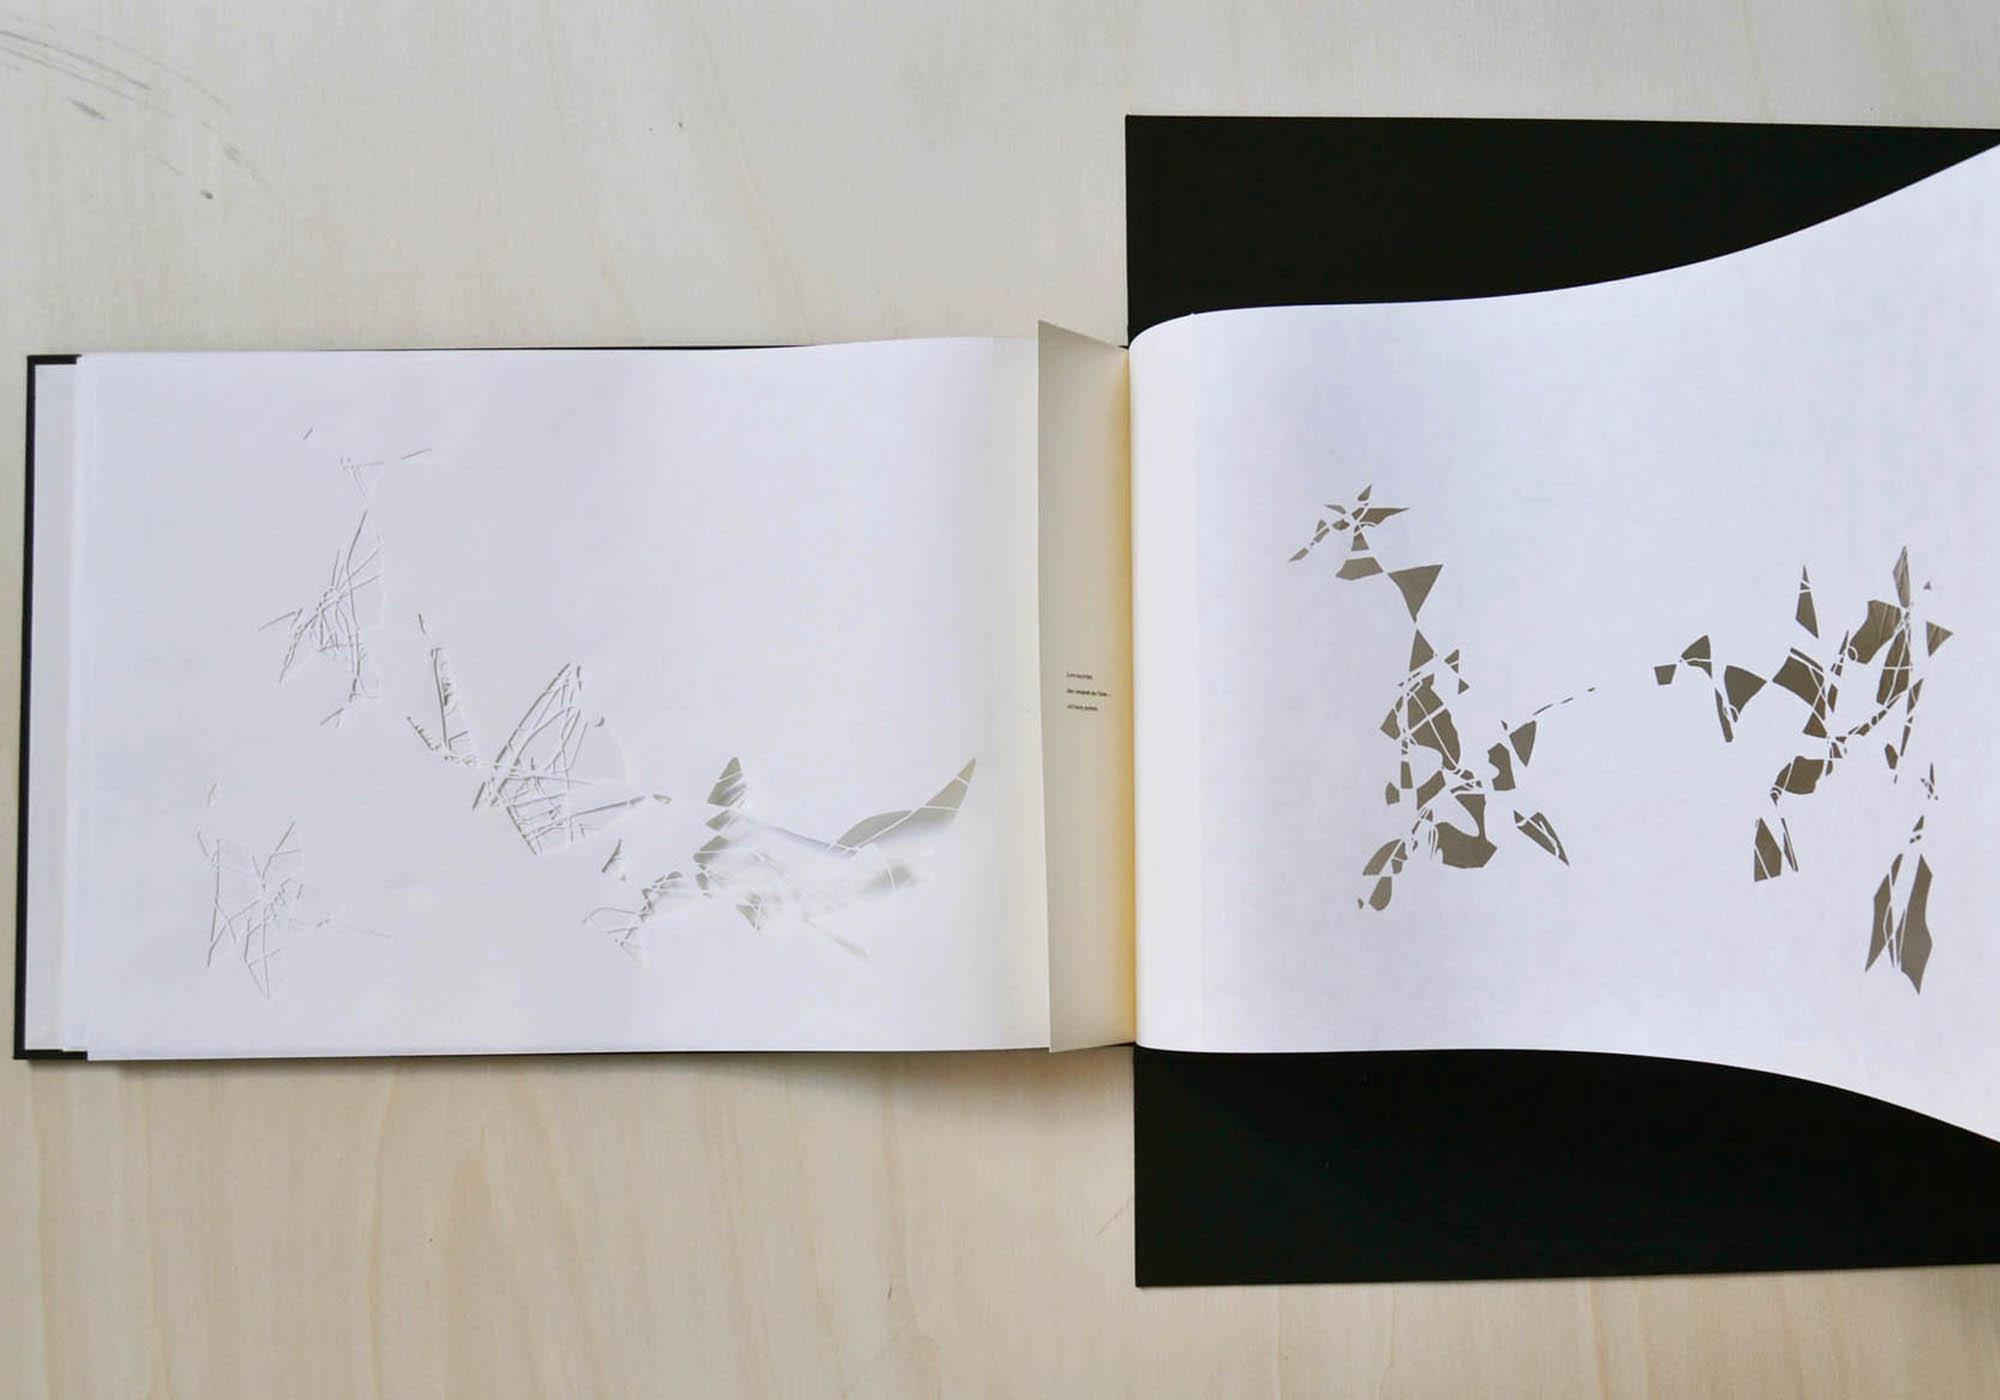 vagbuch.2000